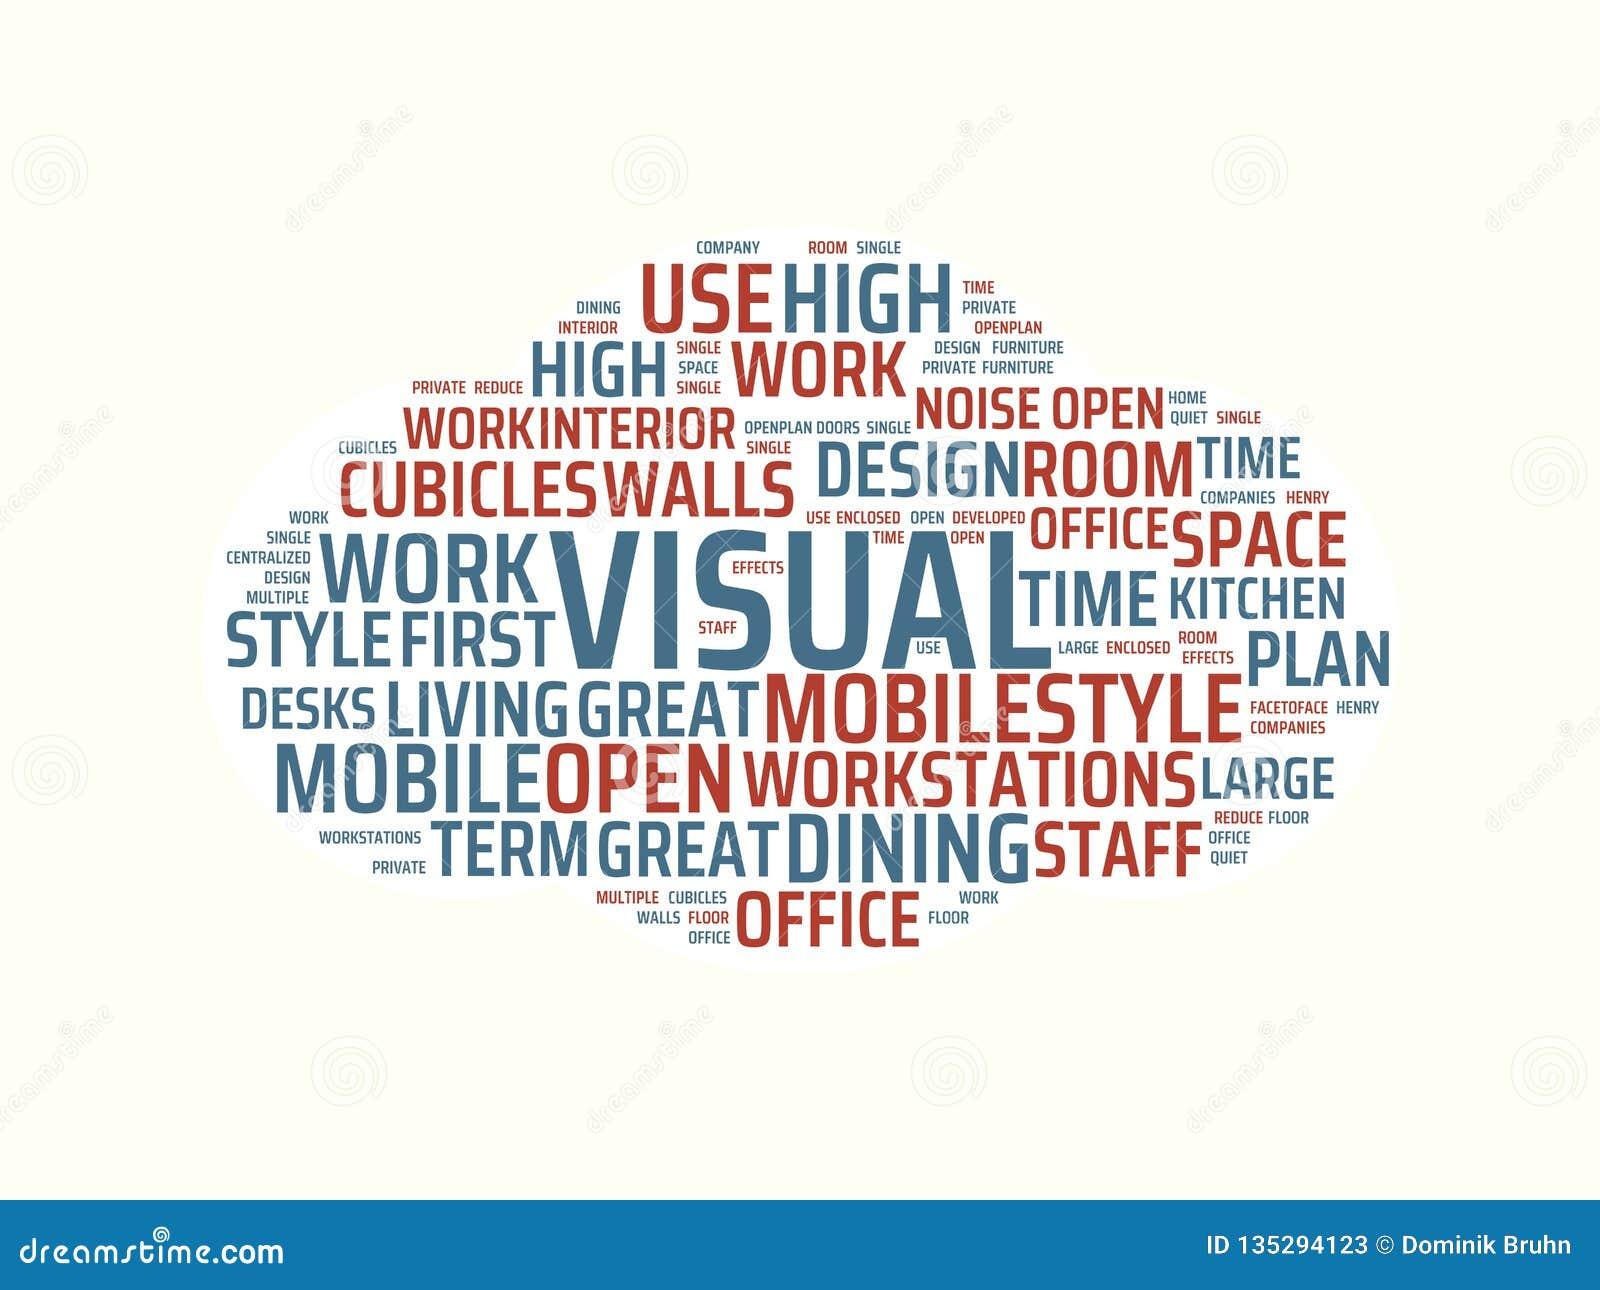 Wordcloud με τις κύριες οπτικές και σχετικές λέξεις λέξης, αφηρημένη απεικόνιση